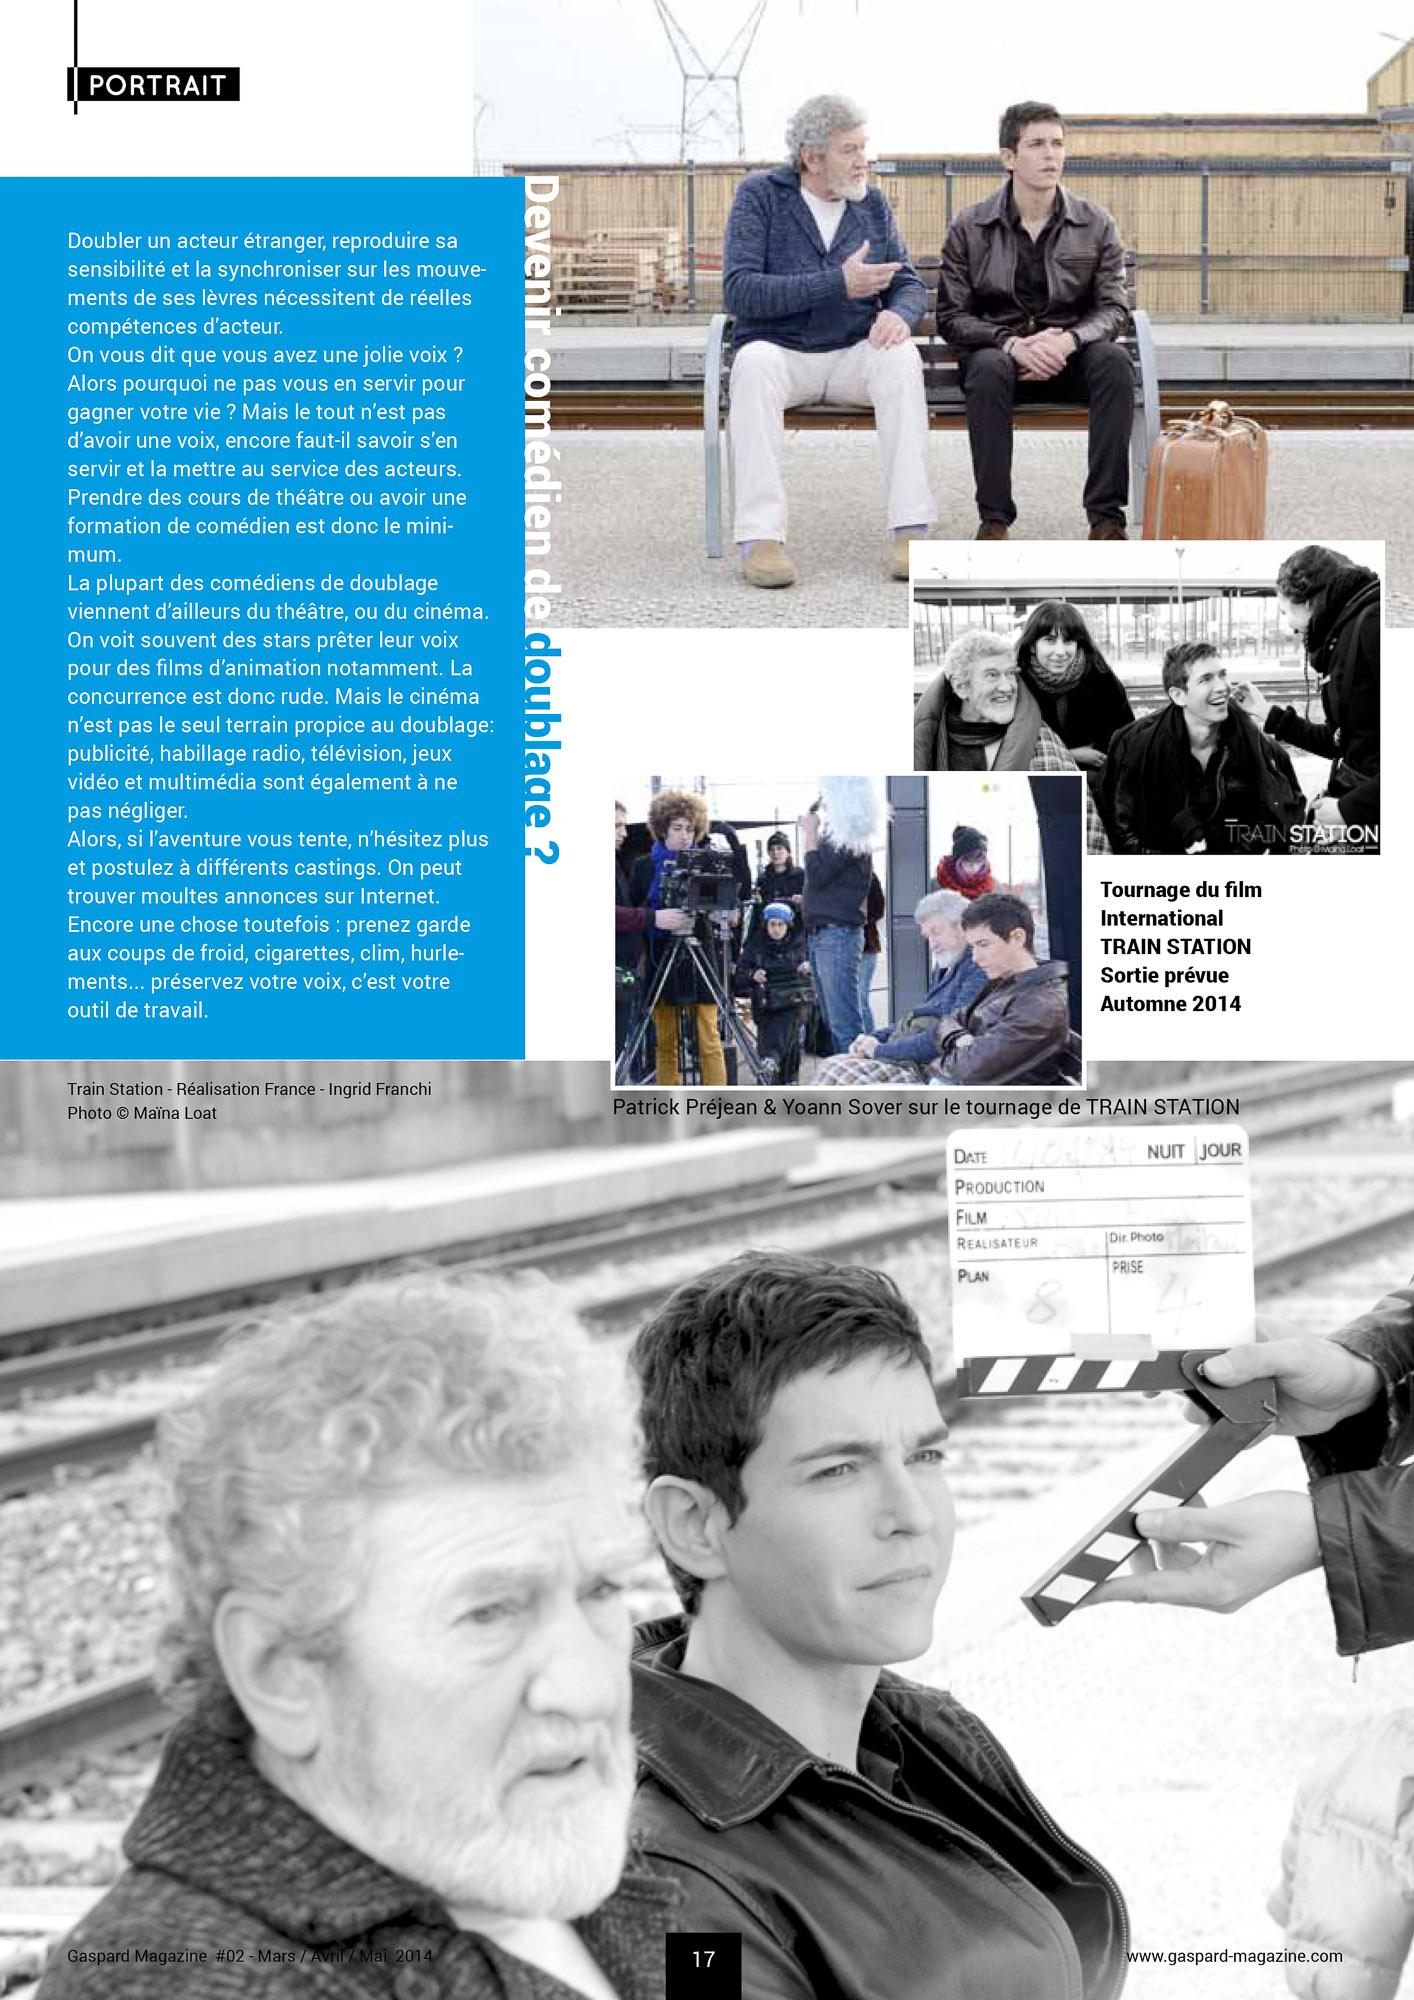 Gaspard Magazine #2 2014